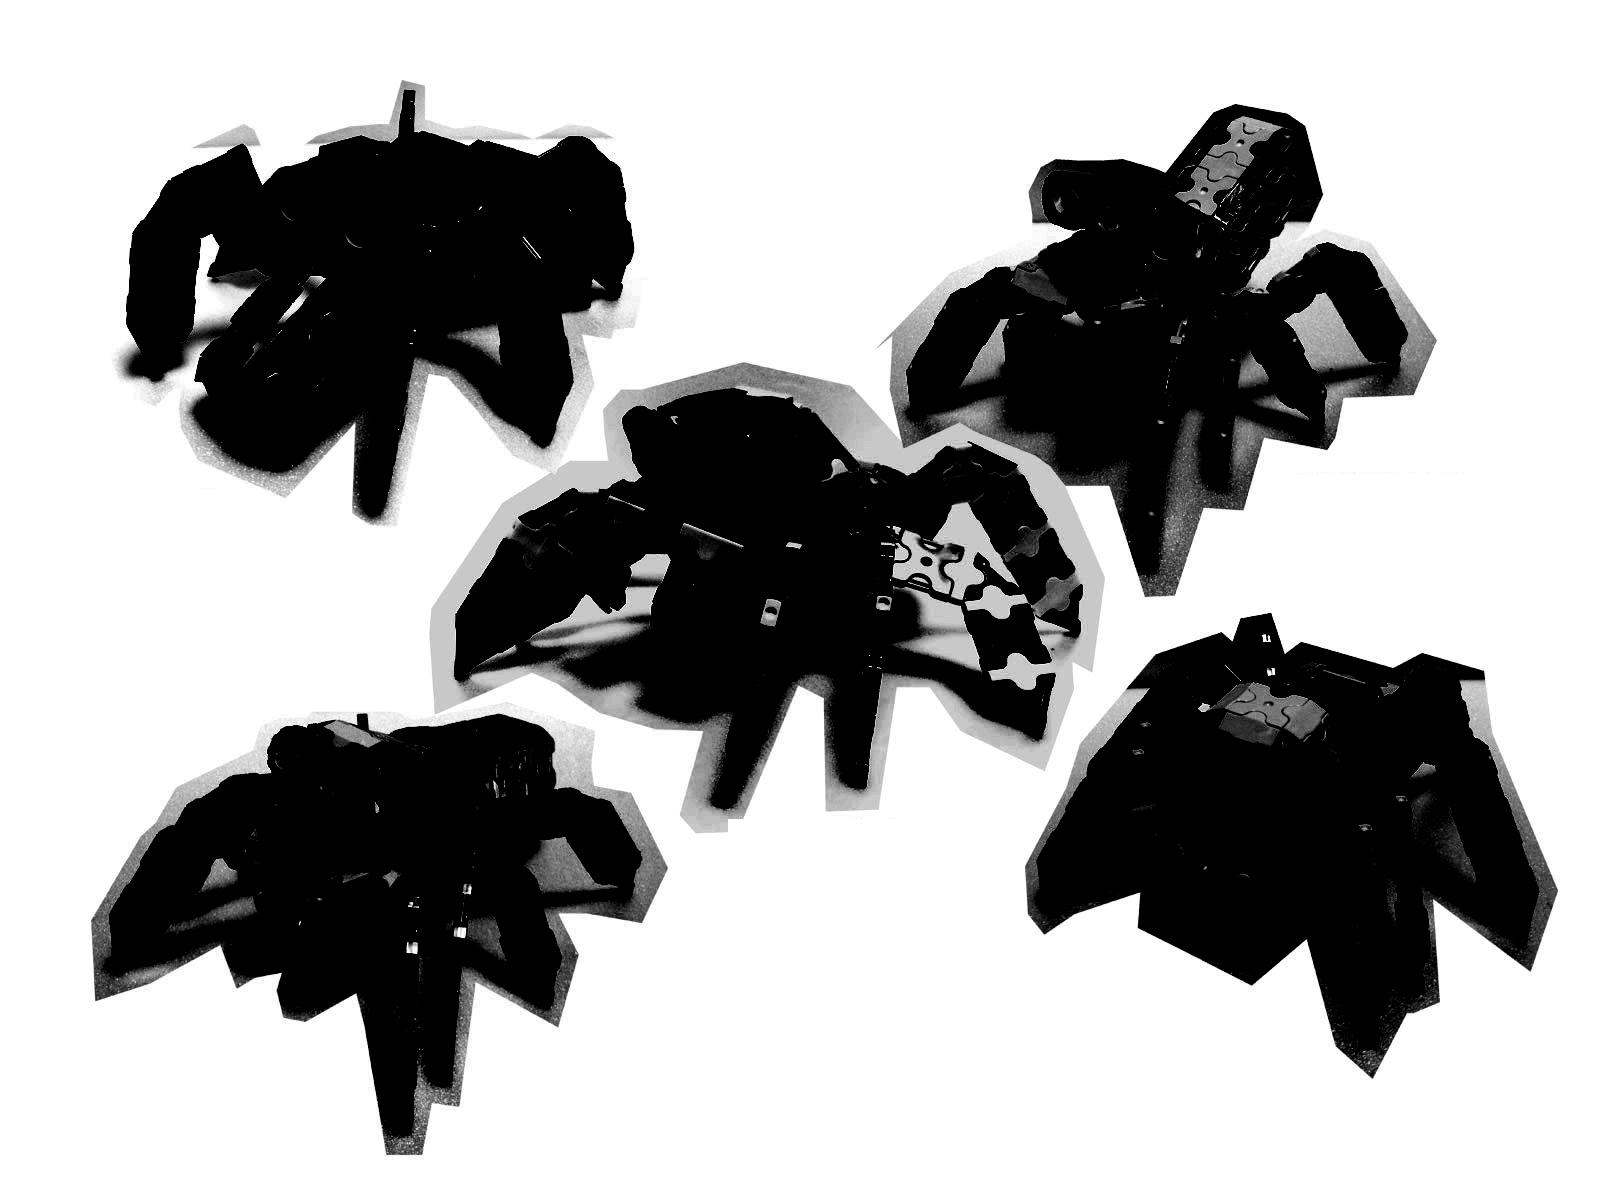 Spider5_IMG_0550s.jpg